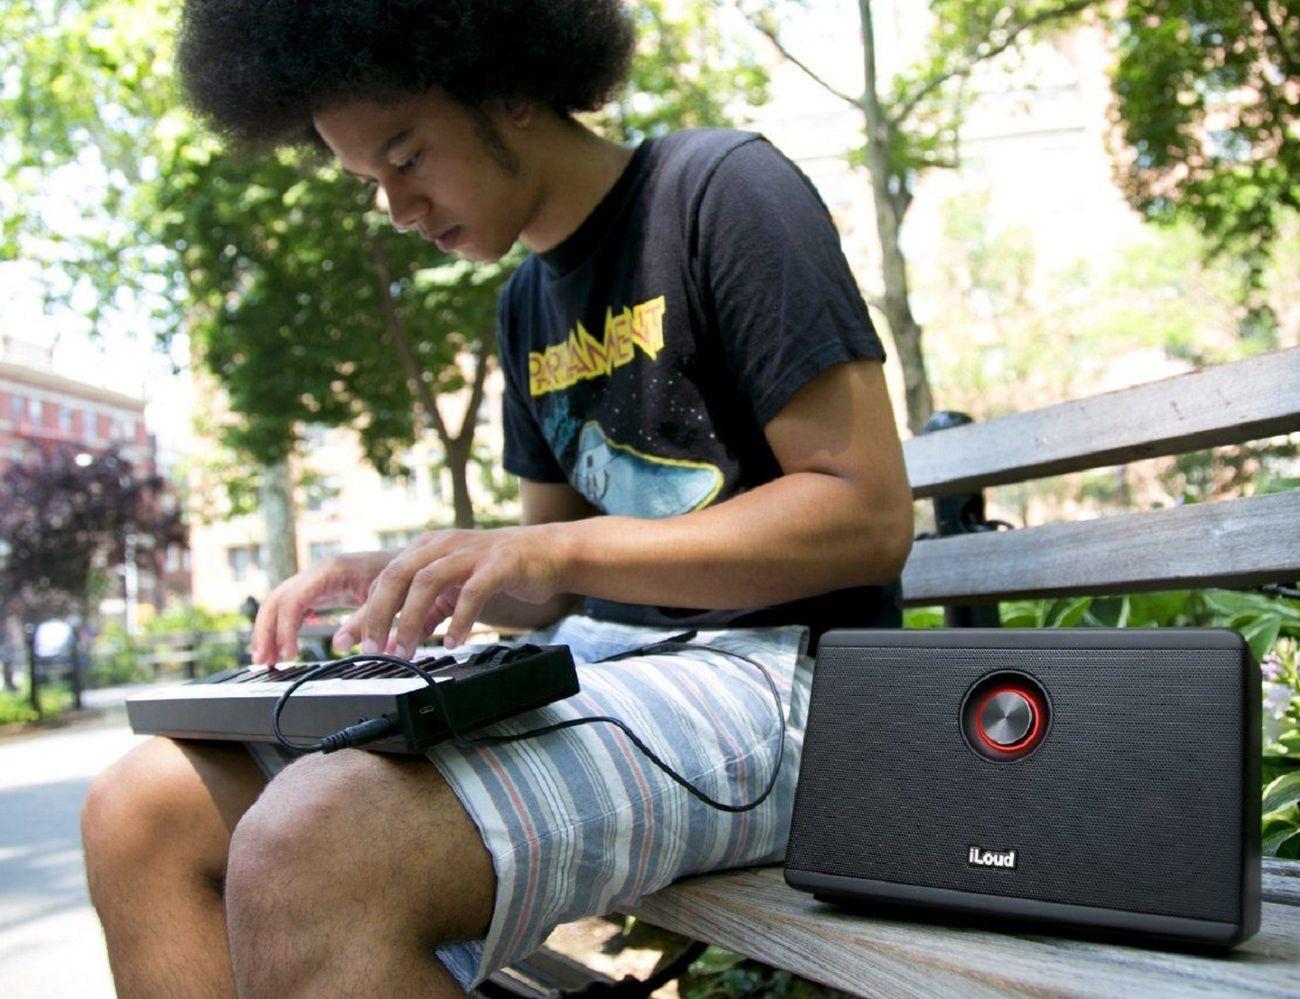 iLoud Portable Personal Speaker